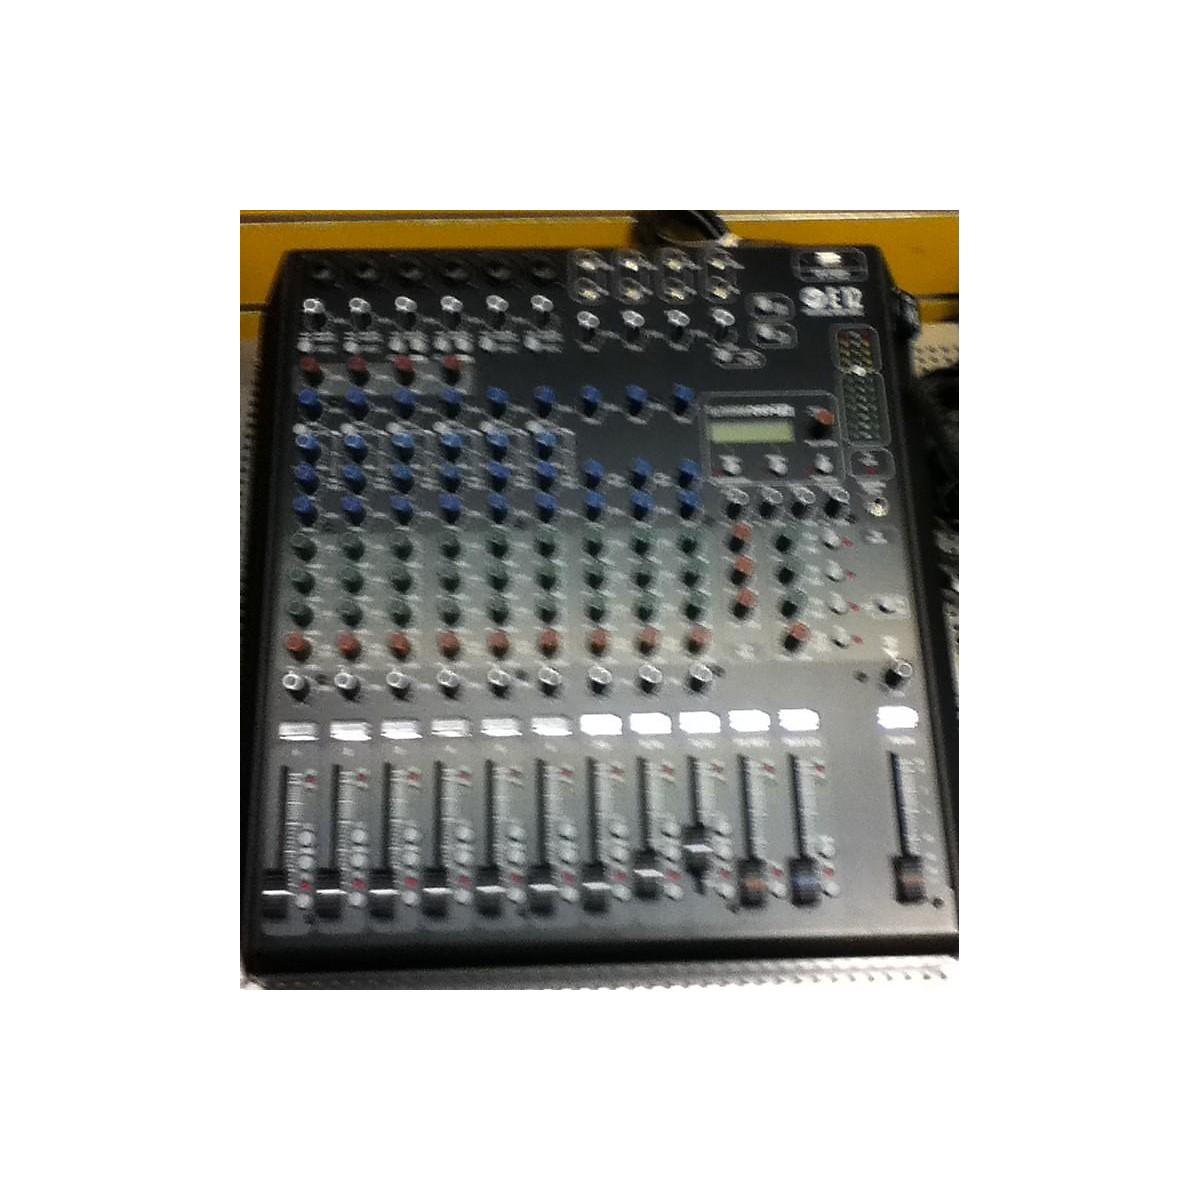 RCF E12 Unpowered Mixer